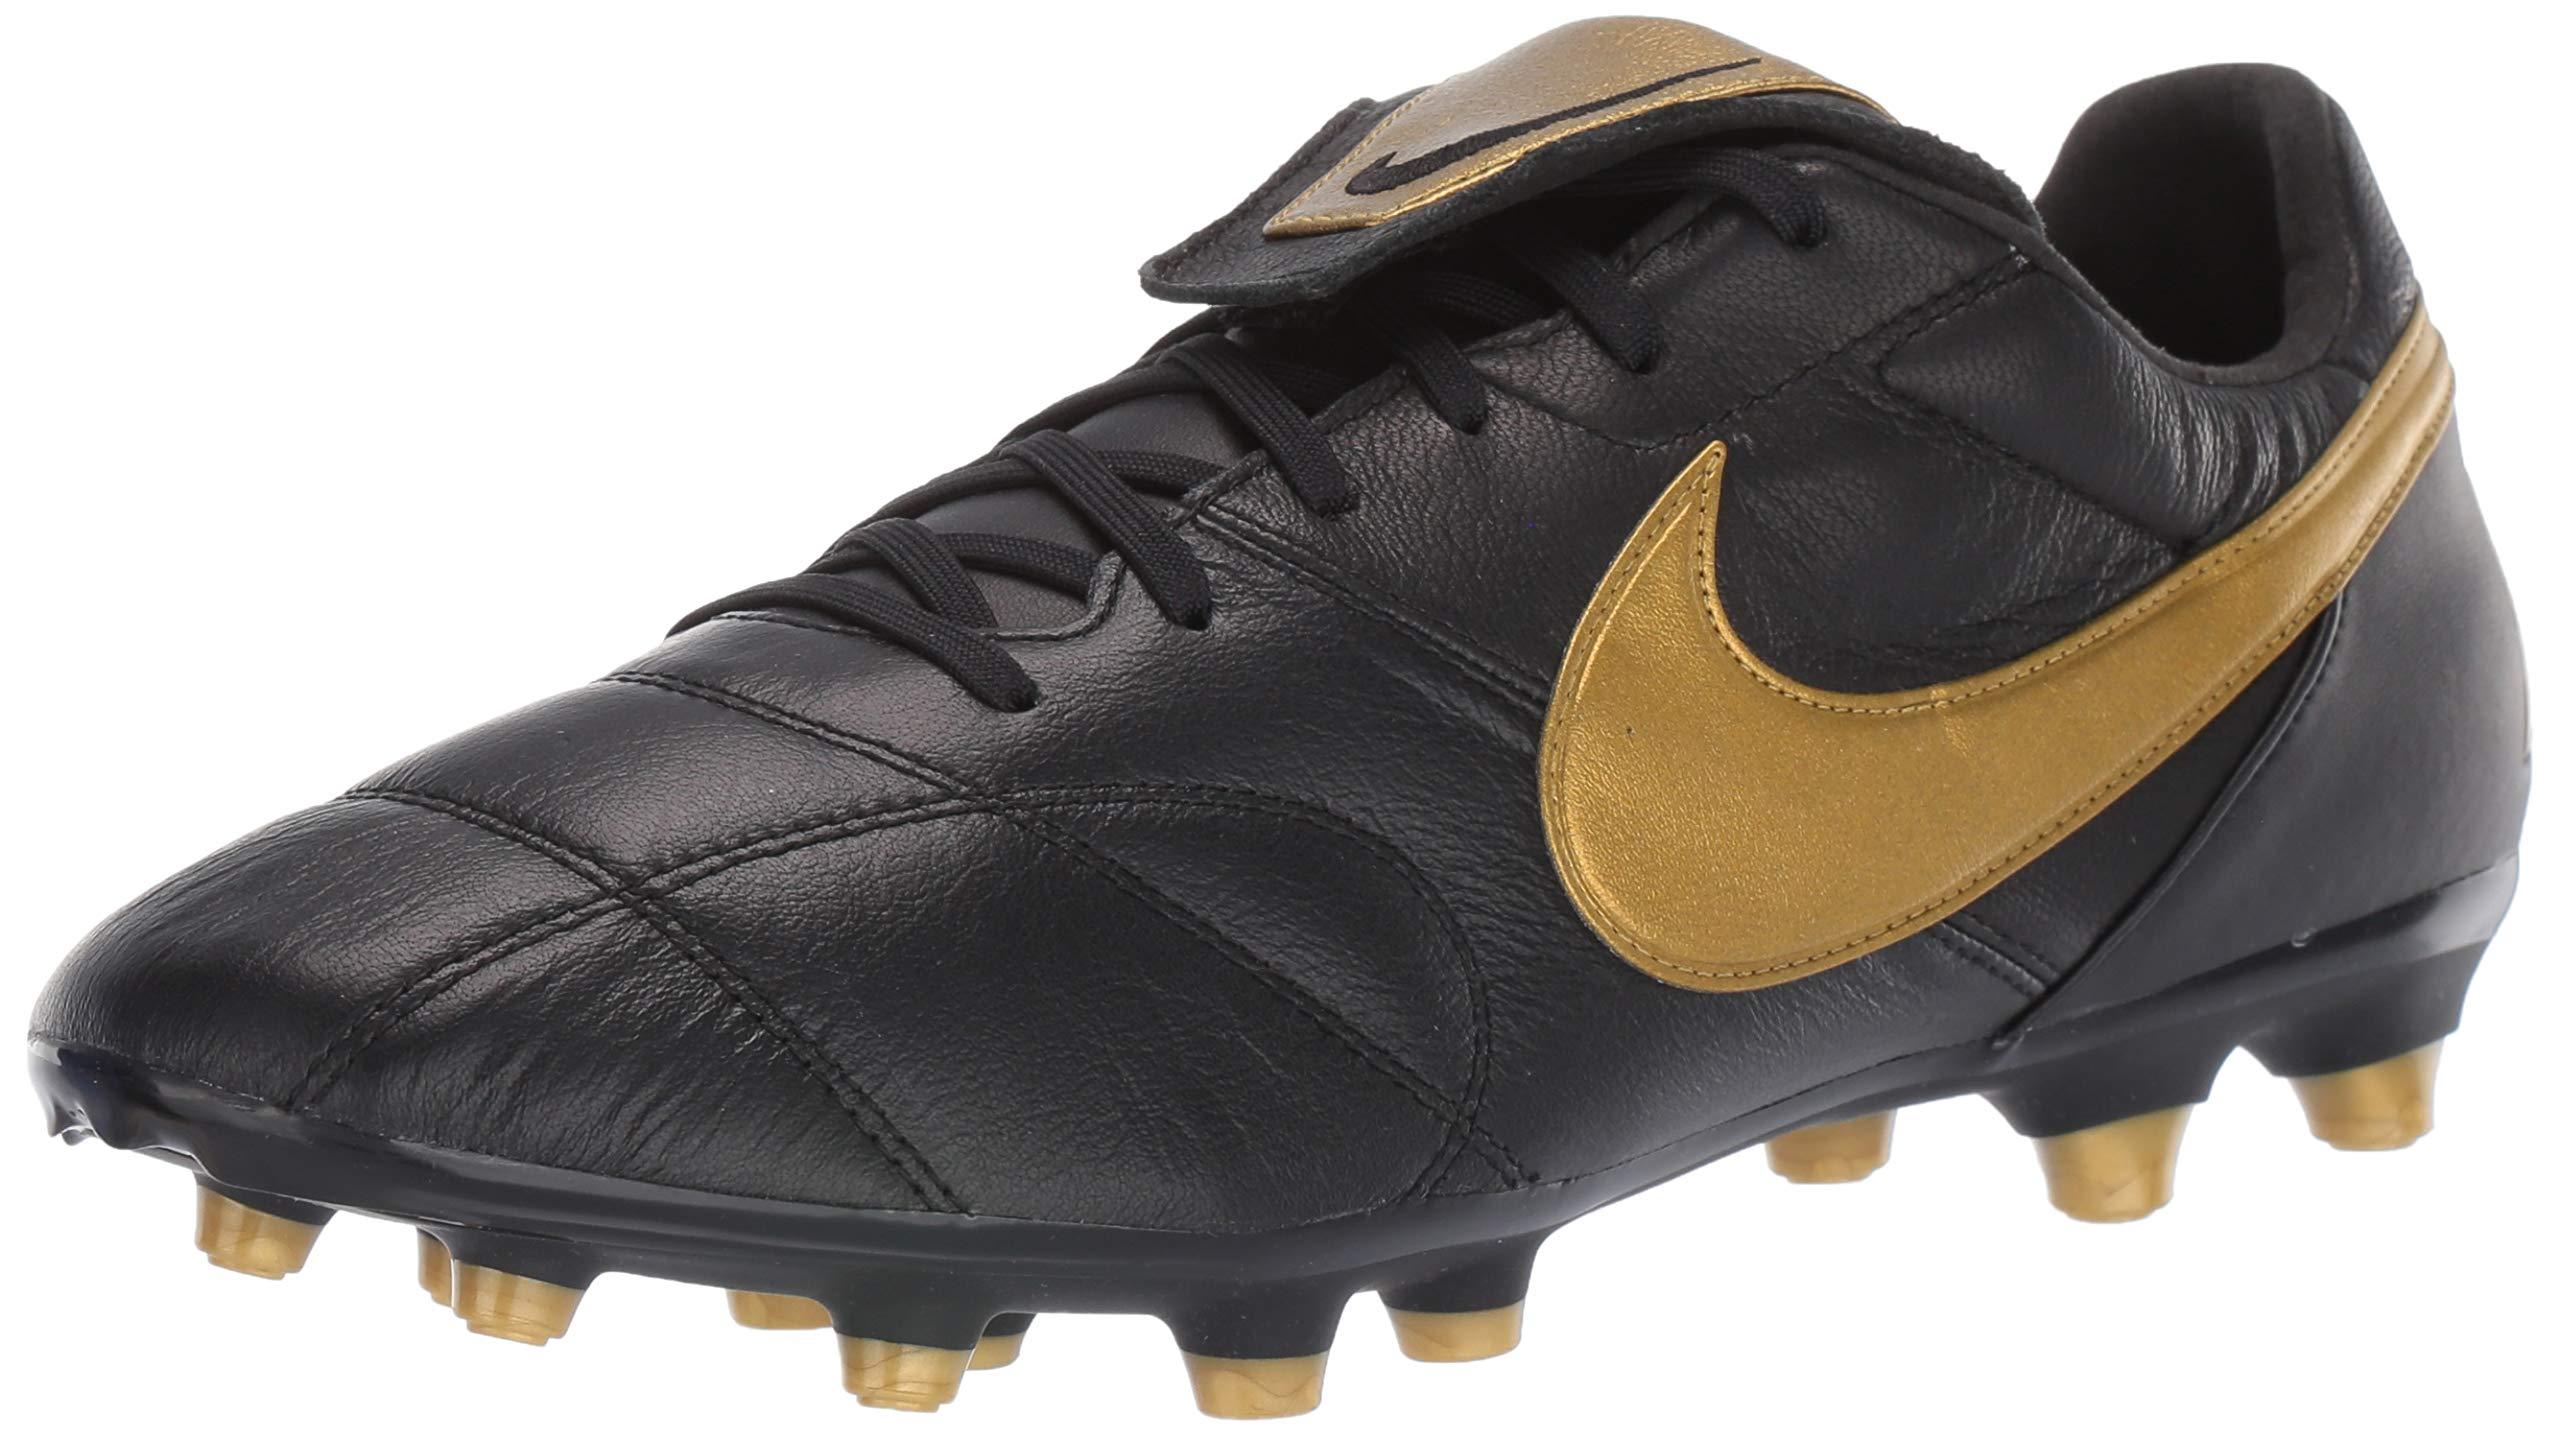 Nike Premier Soccer Cleats Black